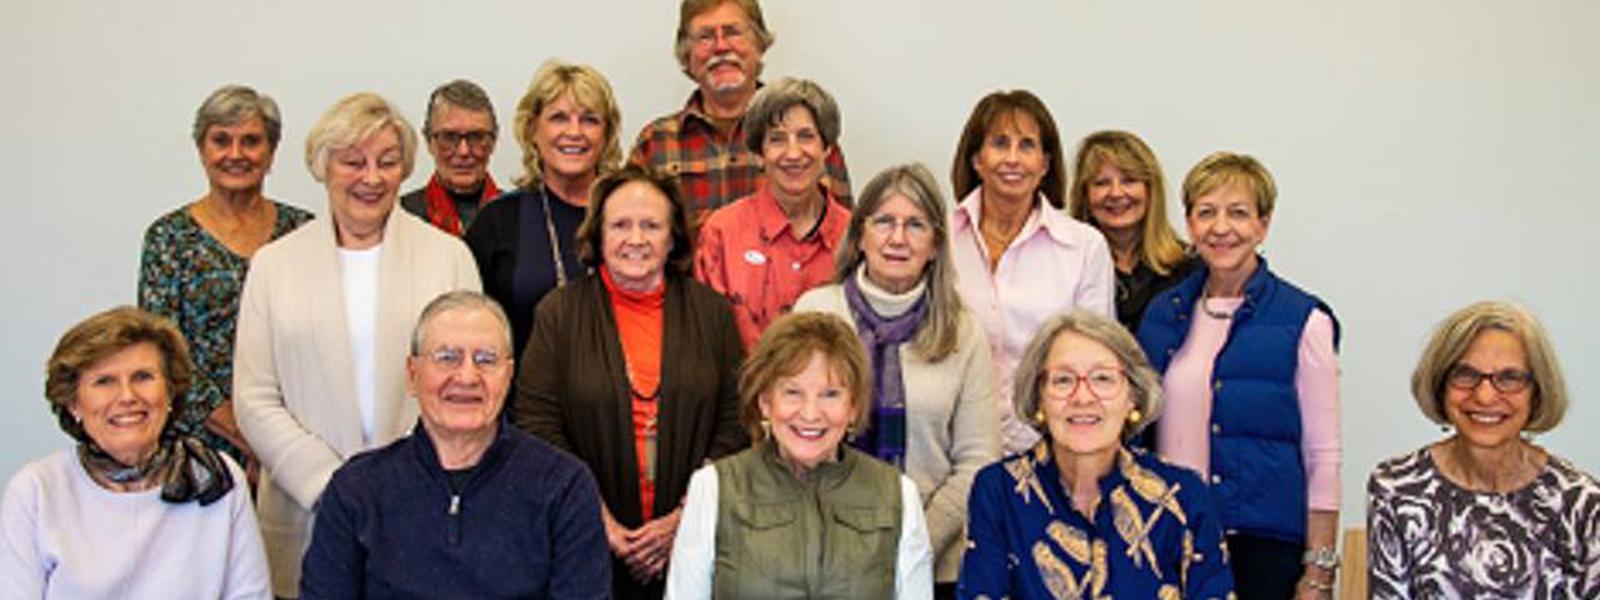 Associates Board Members 2018-2019